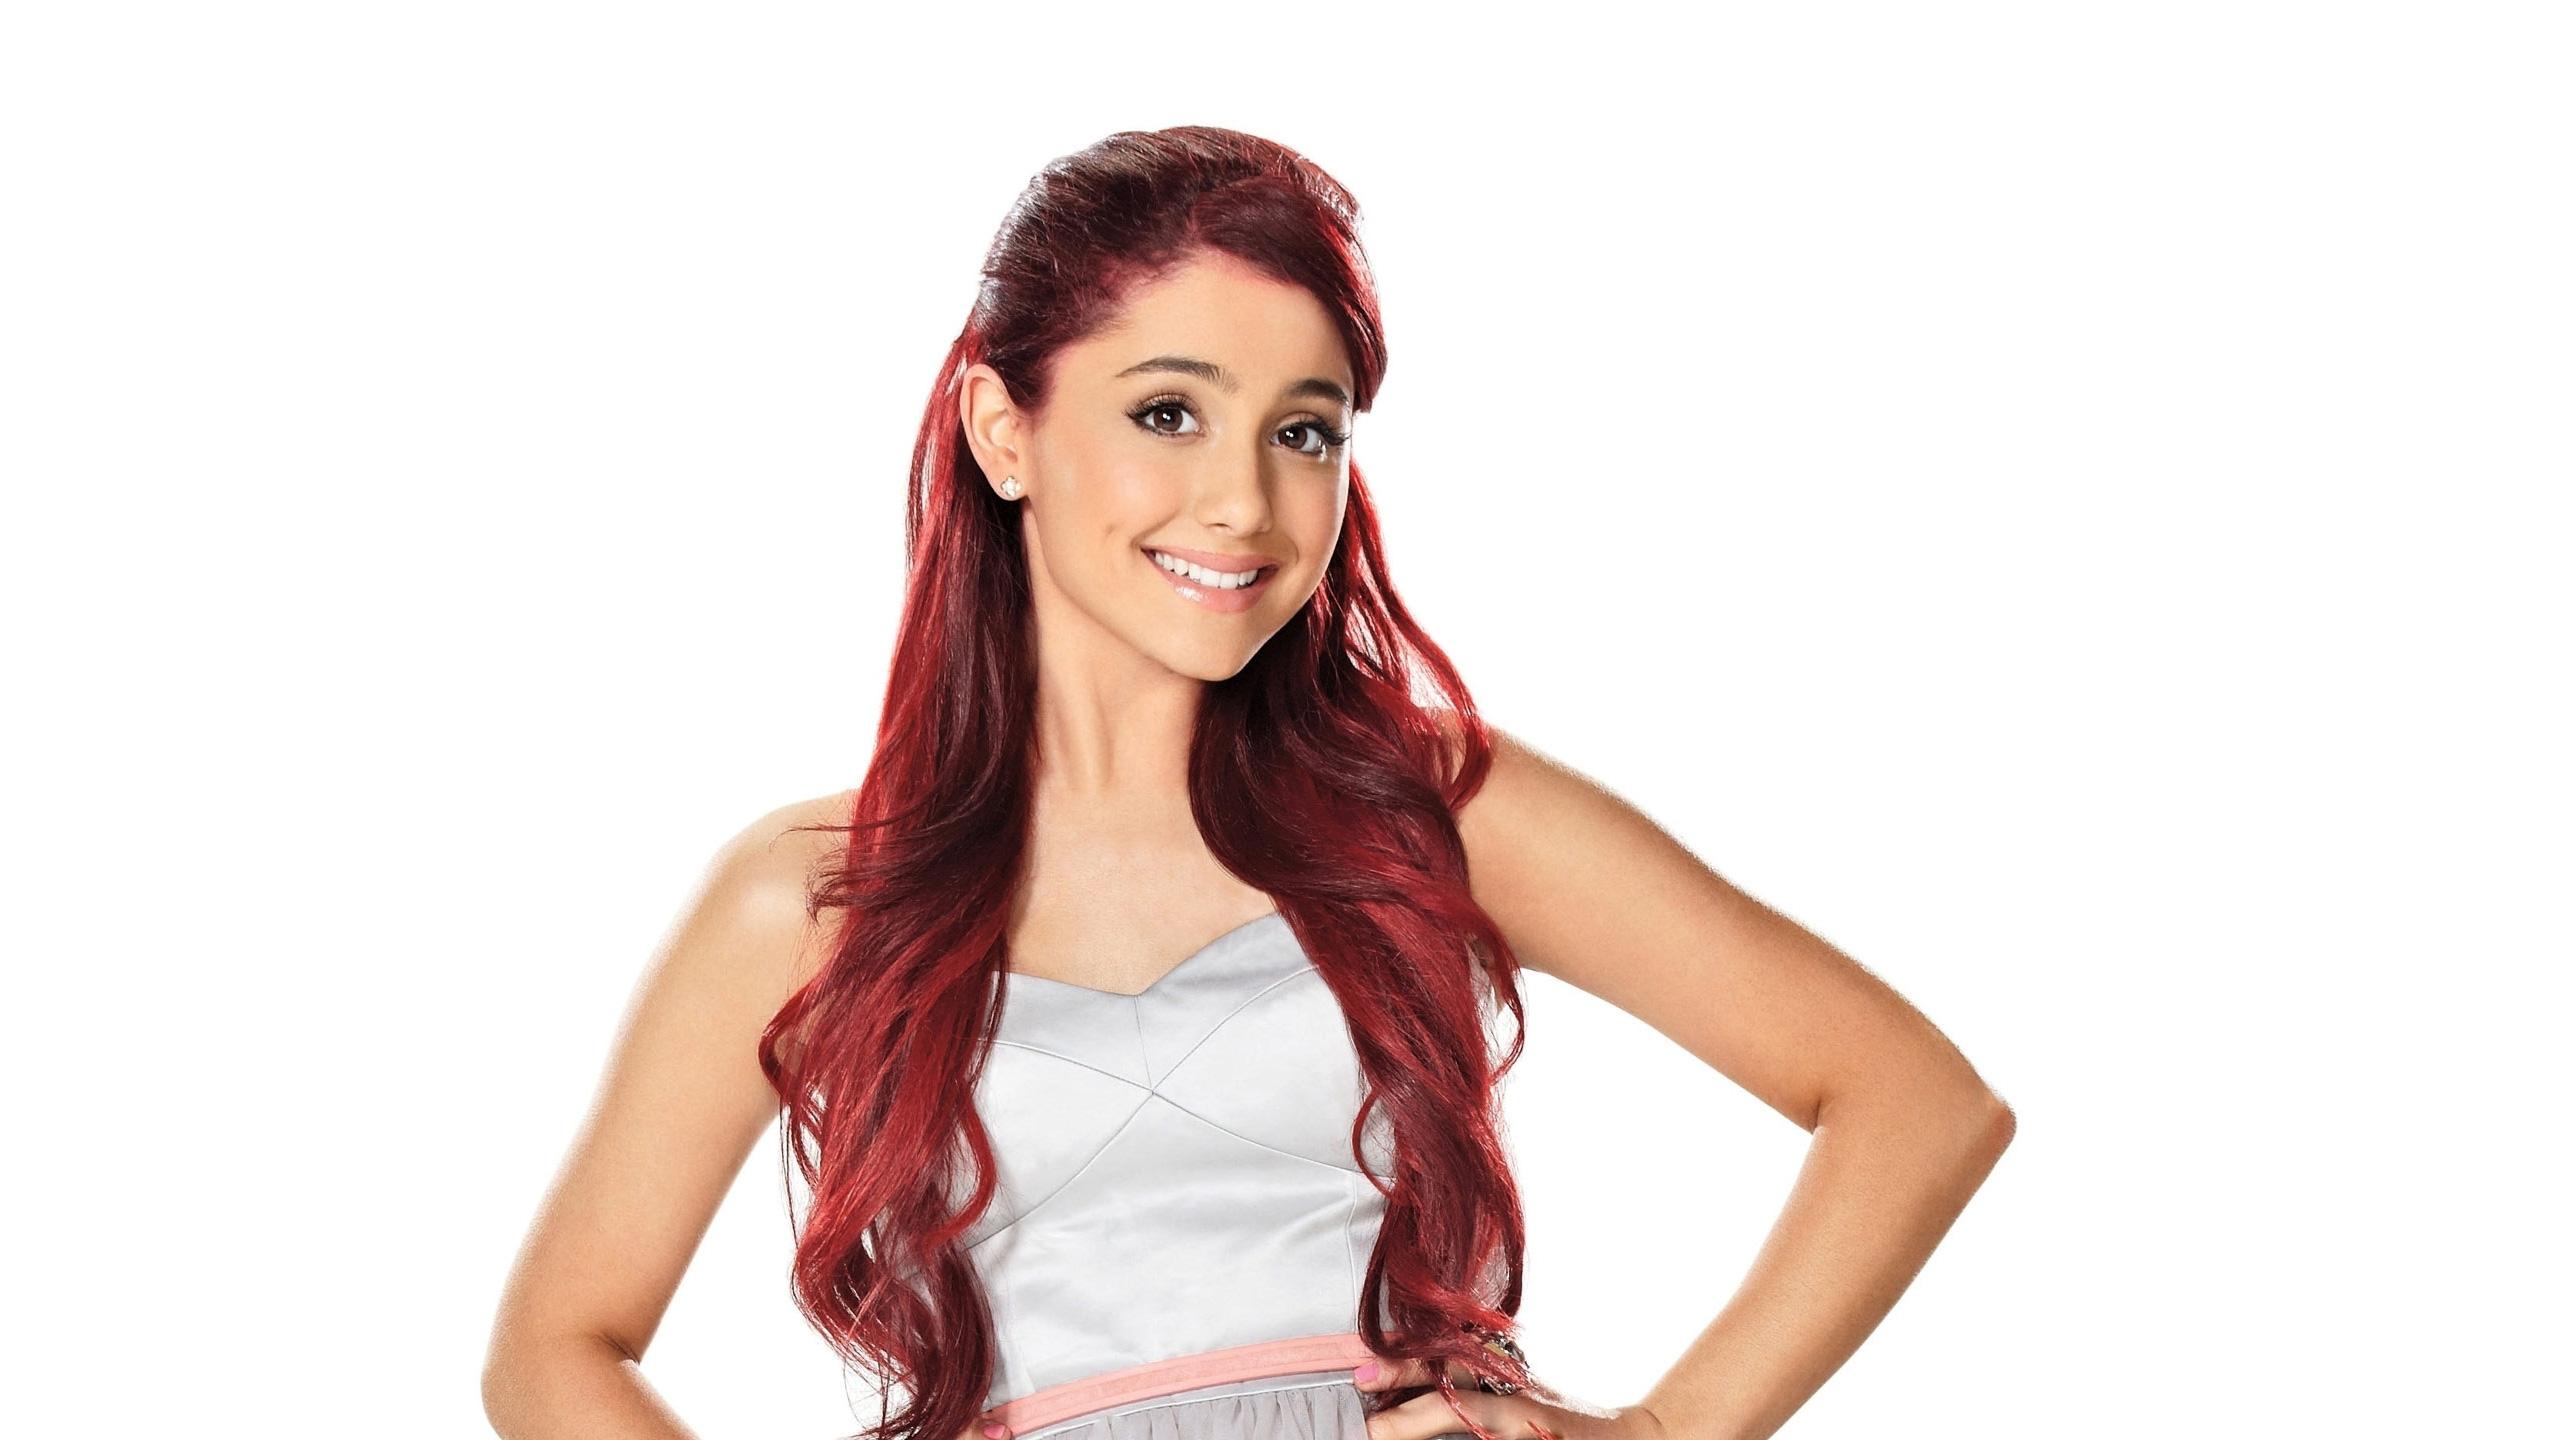 Ariana Grande HD Wallpaper